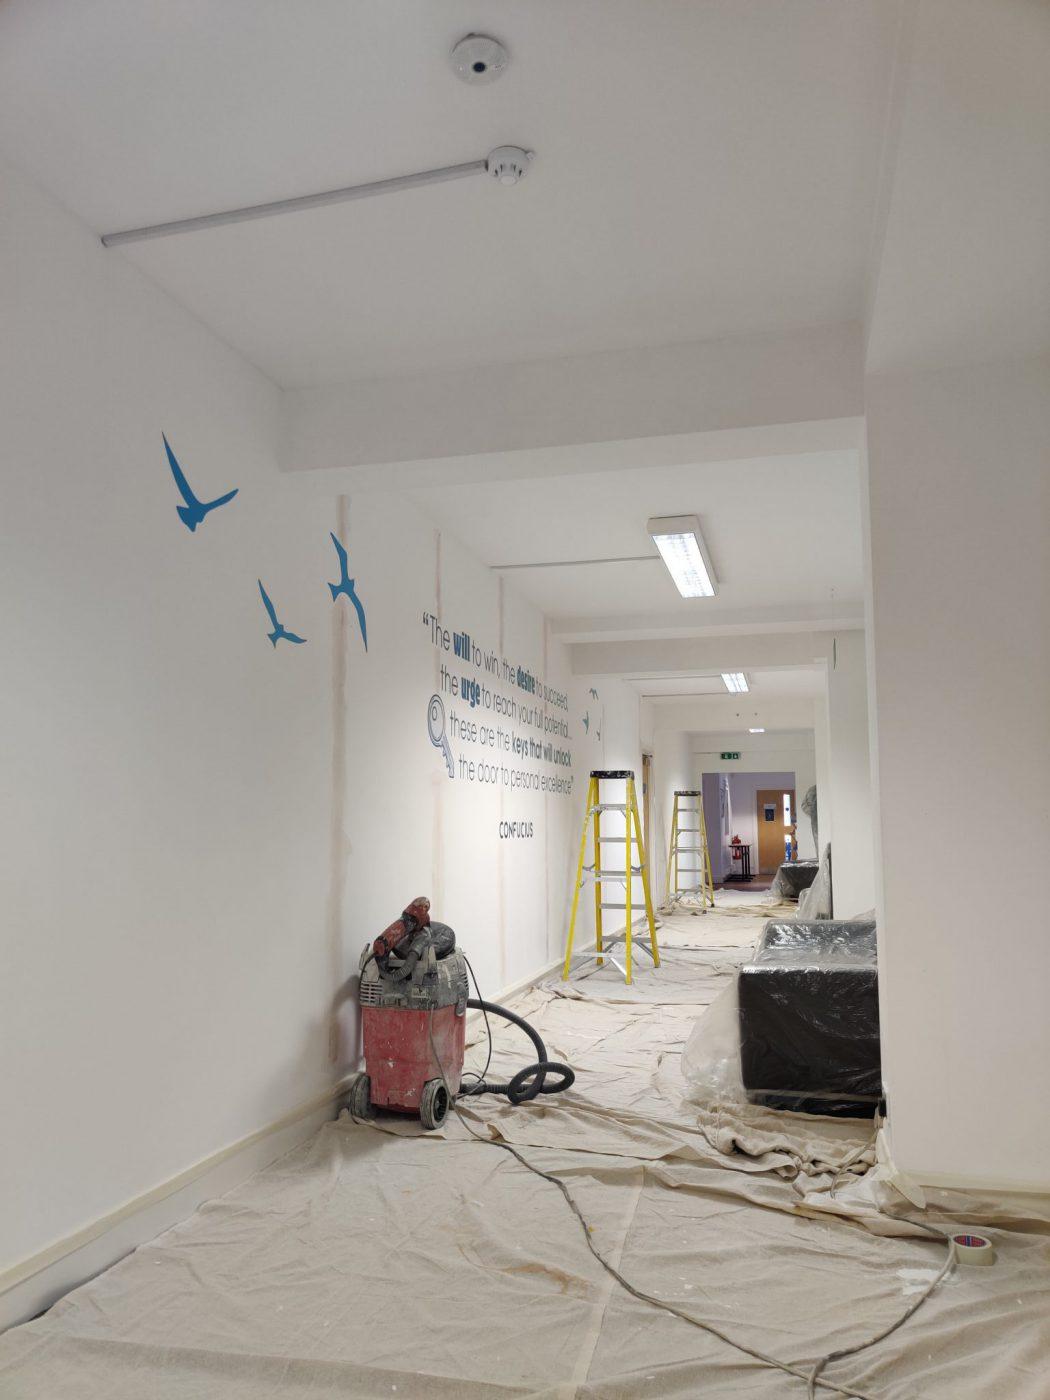 Arden University London School painting & decorating project